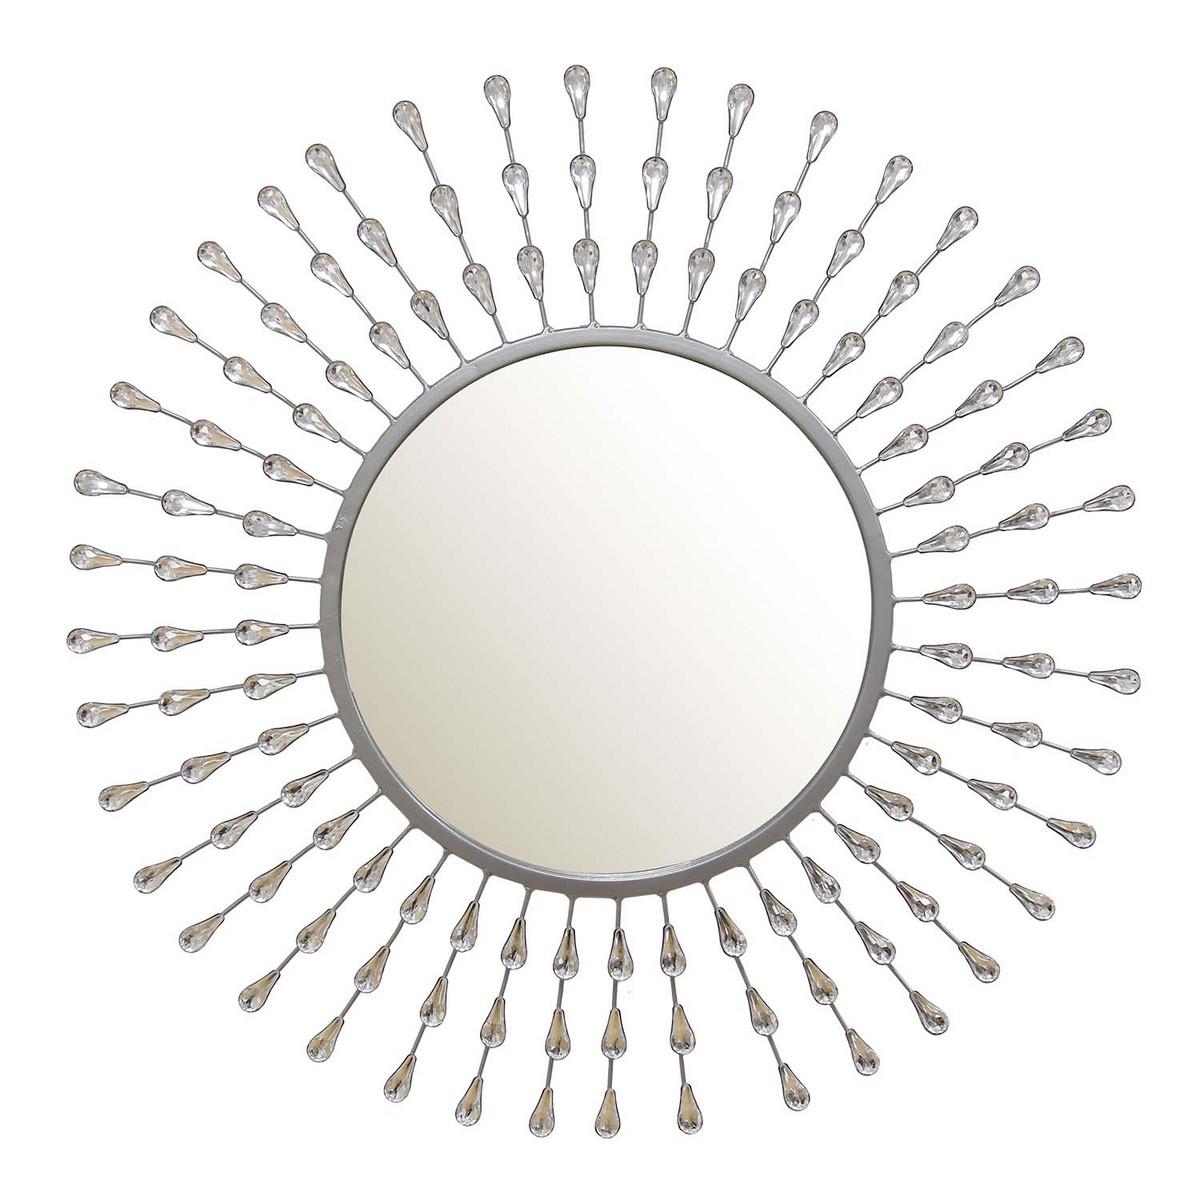 Stratton Home Decor Melissa Tear Drop Mirror - Silver